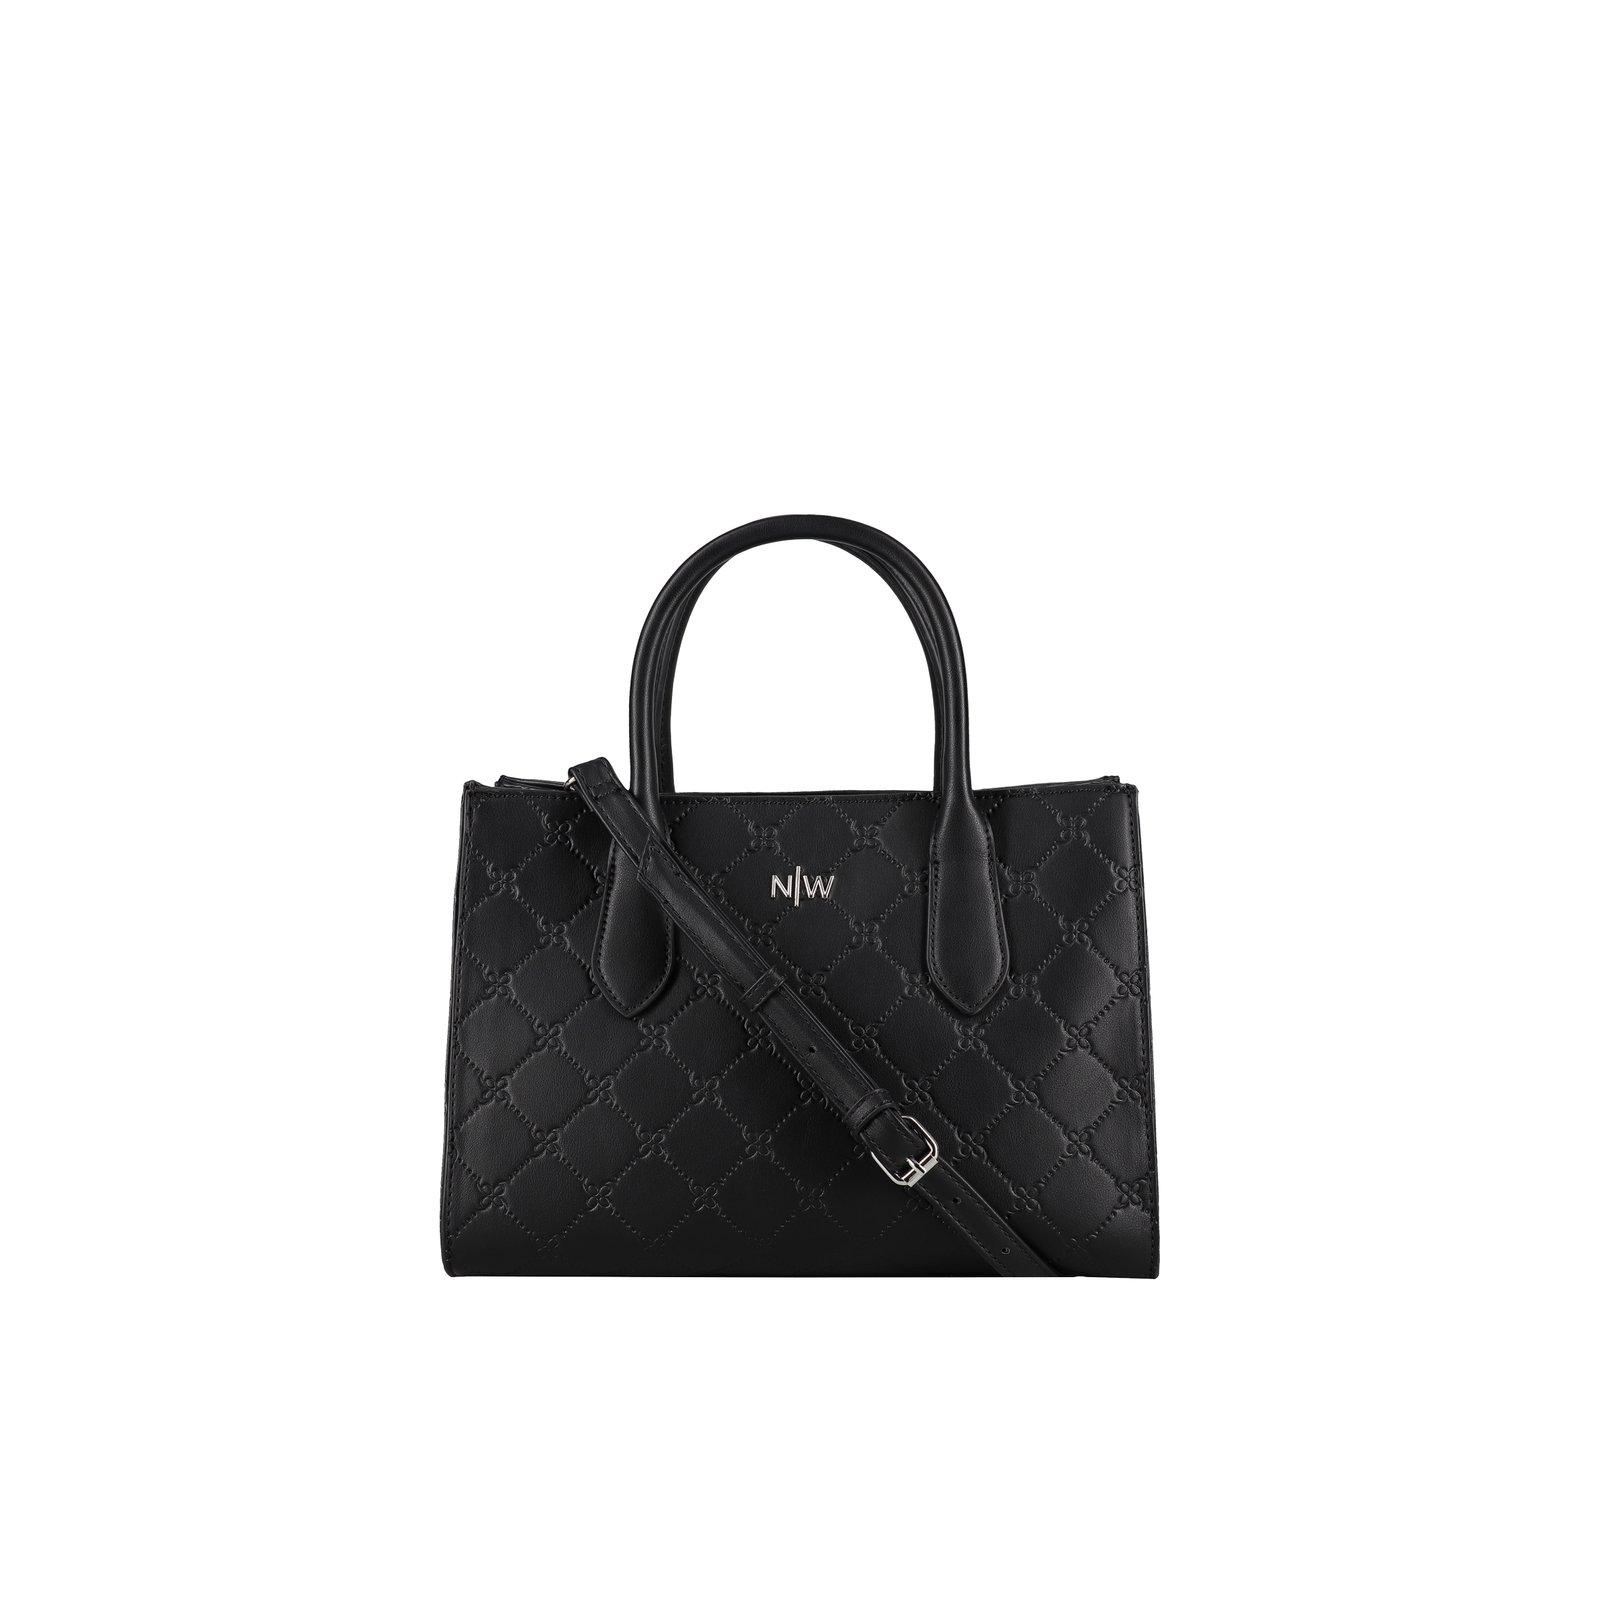 Nine West Fedya - Women's Handbags - Black photo